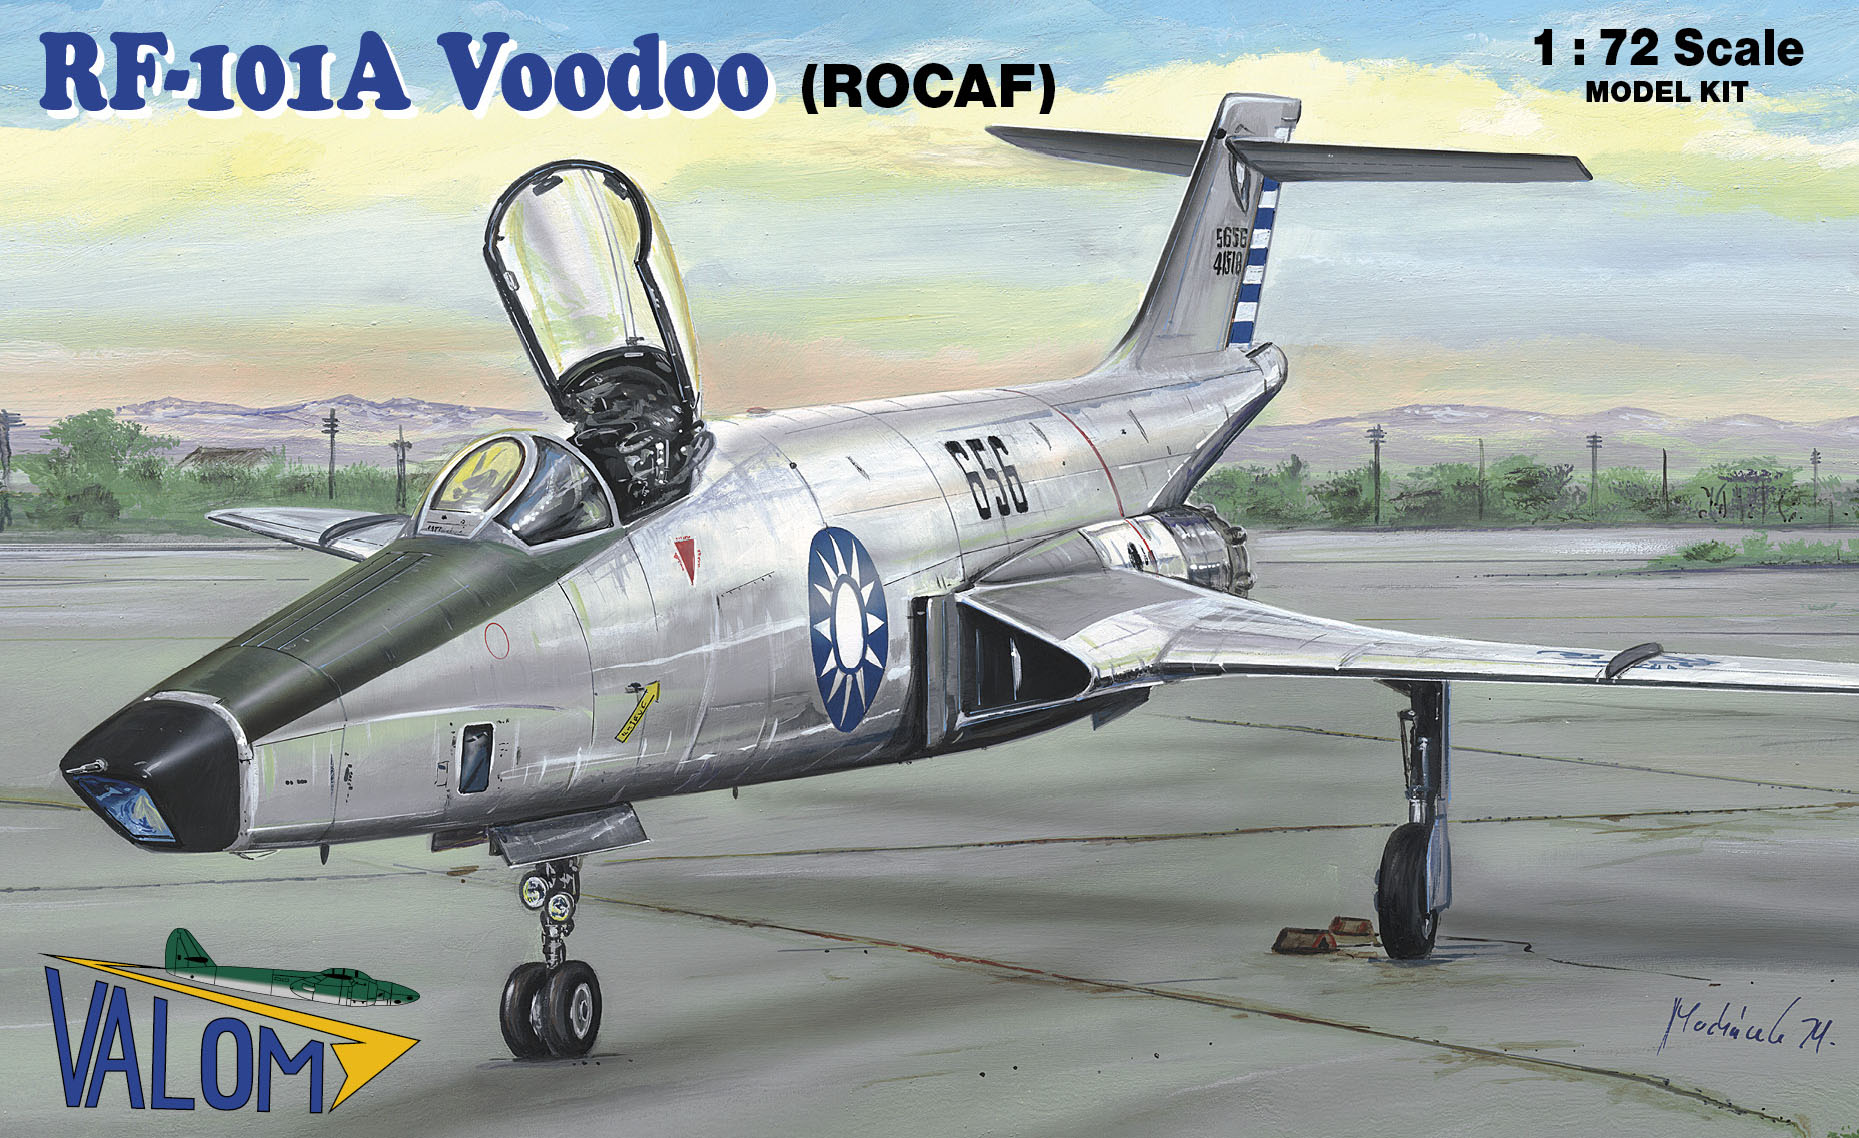 Valom RF-101A Voodoo (ROCAF)